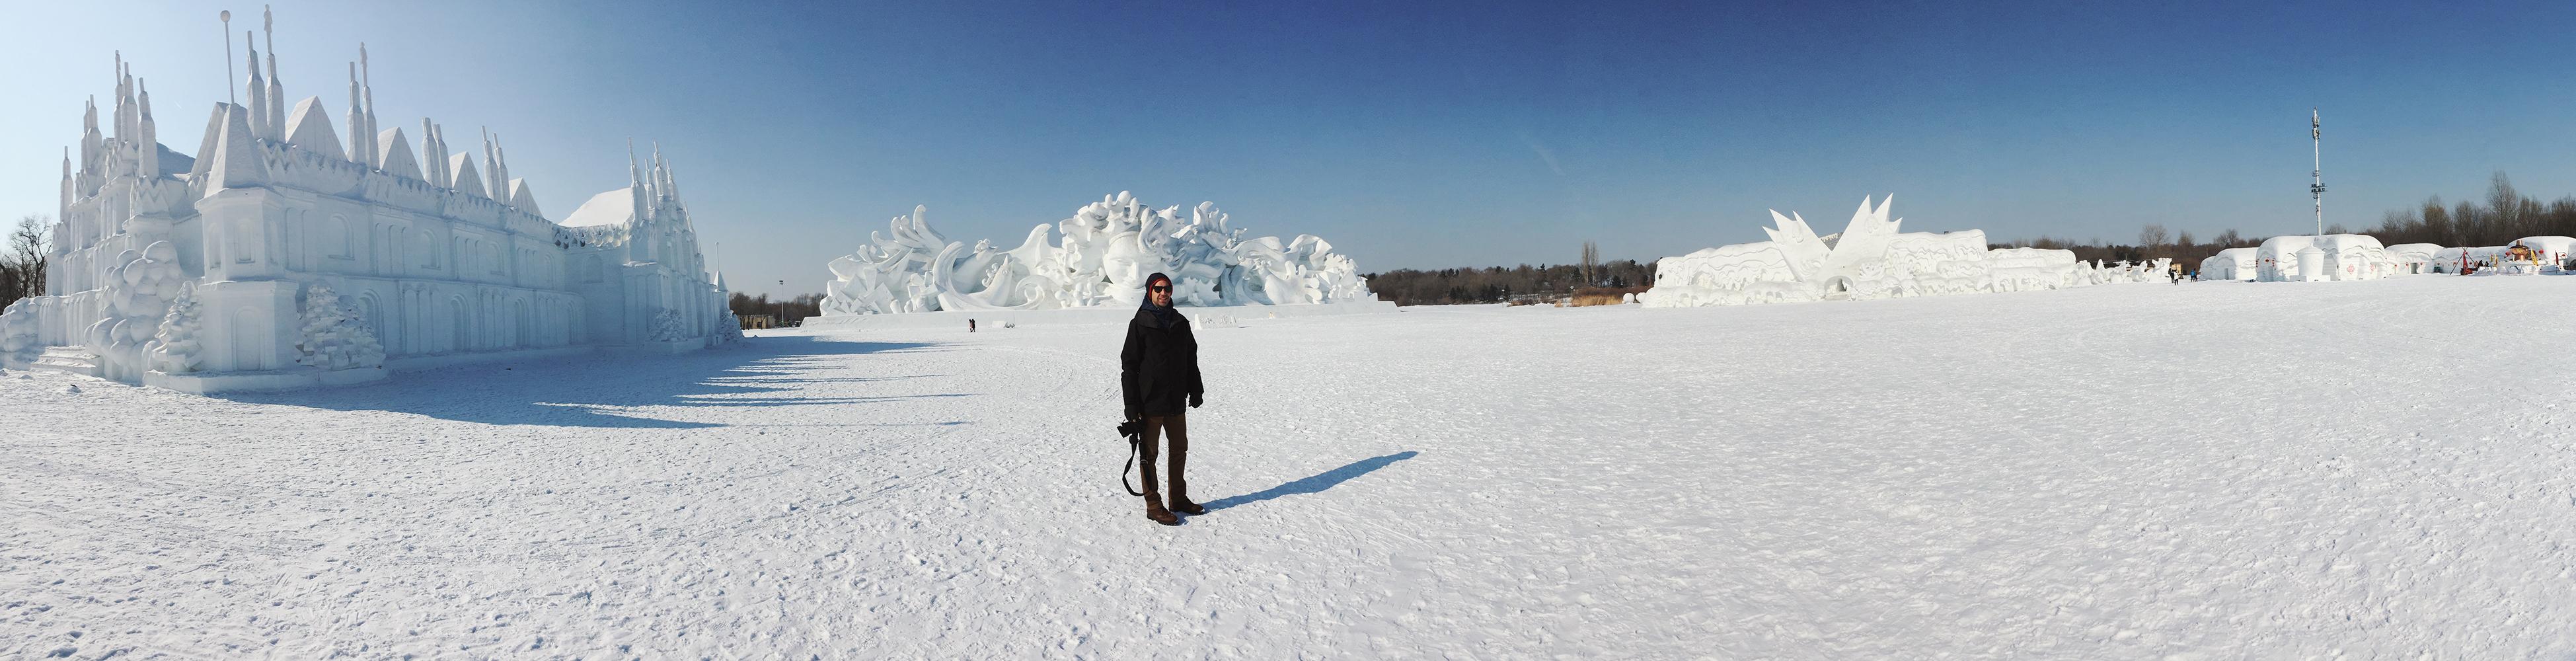 Snow Ice festival